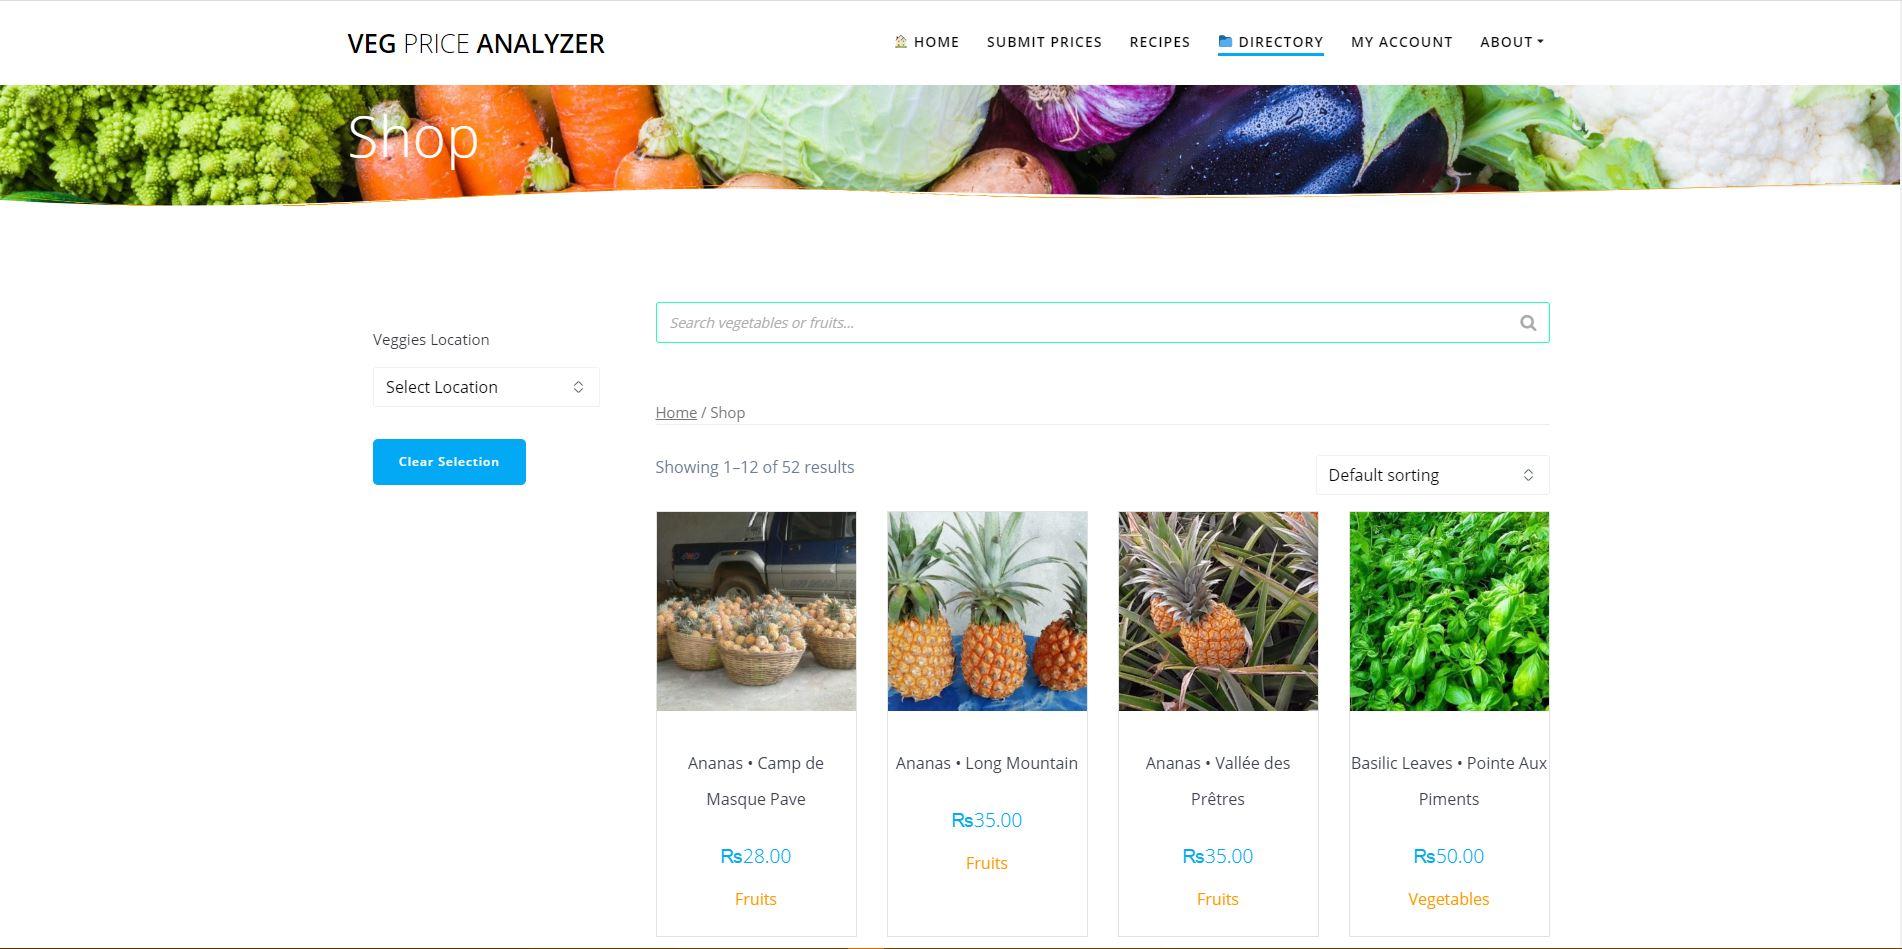 VEG-PRICE-ANALYZER-Digital-Marketing-Mauritius-E-Commerce